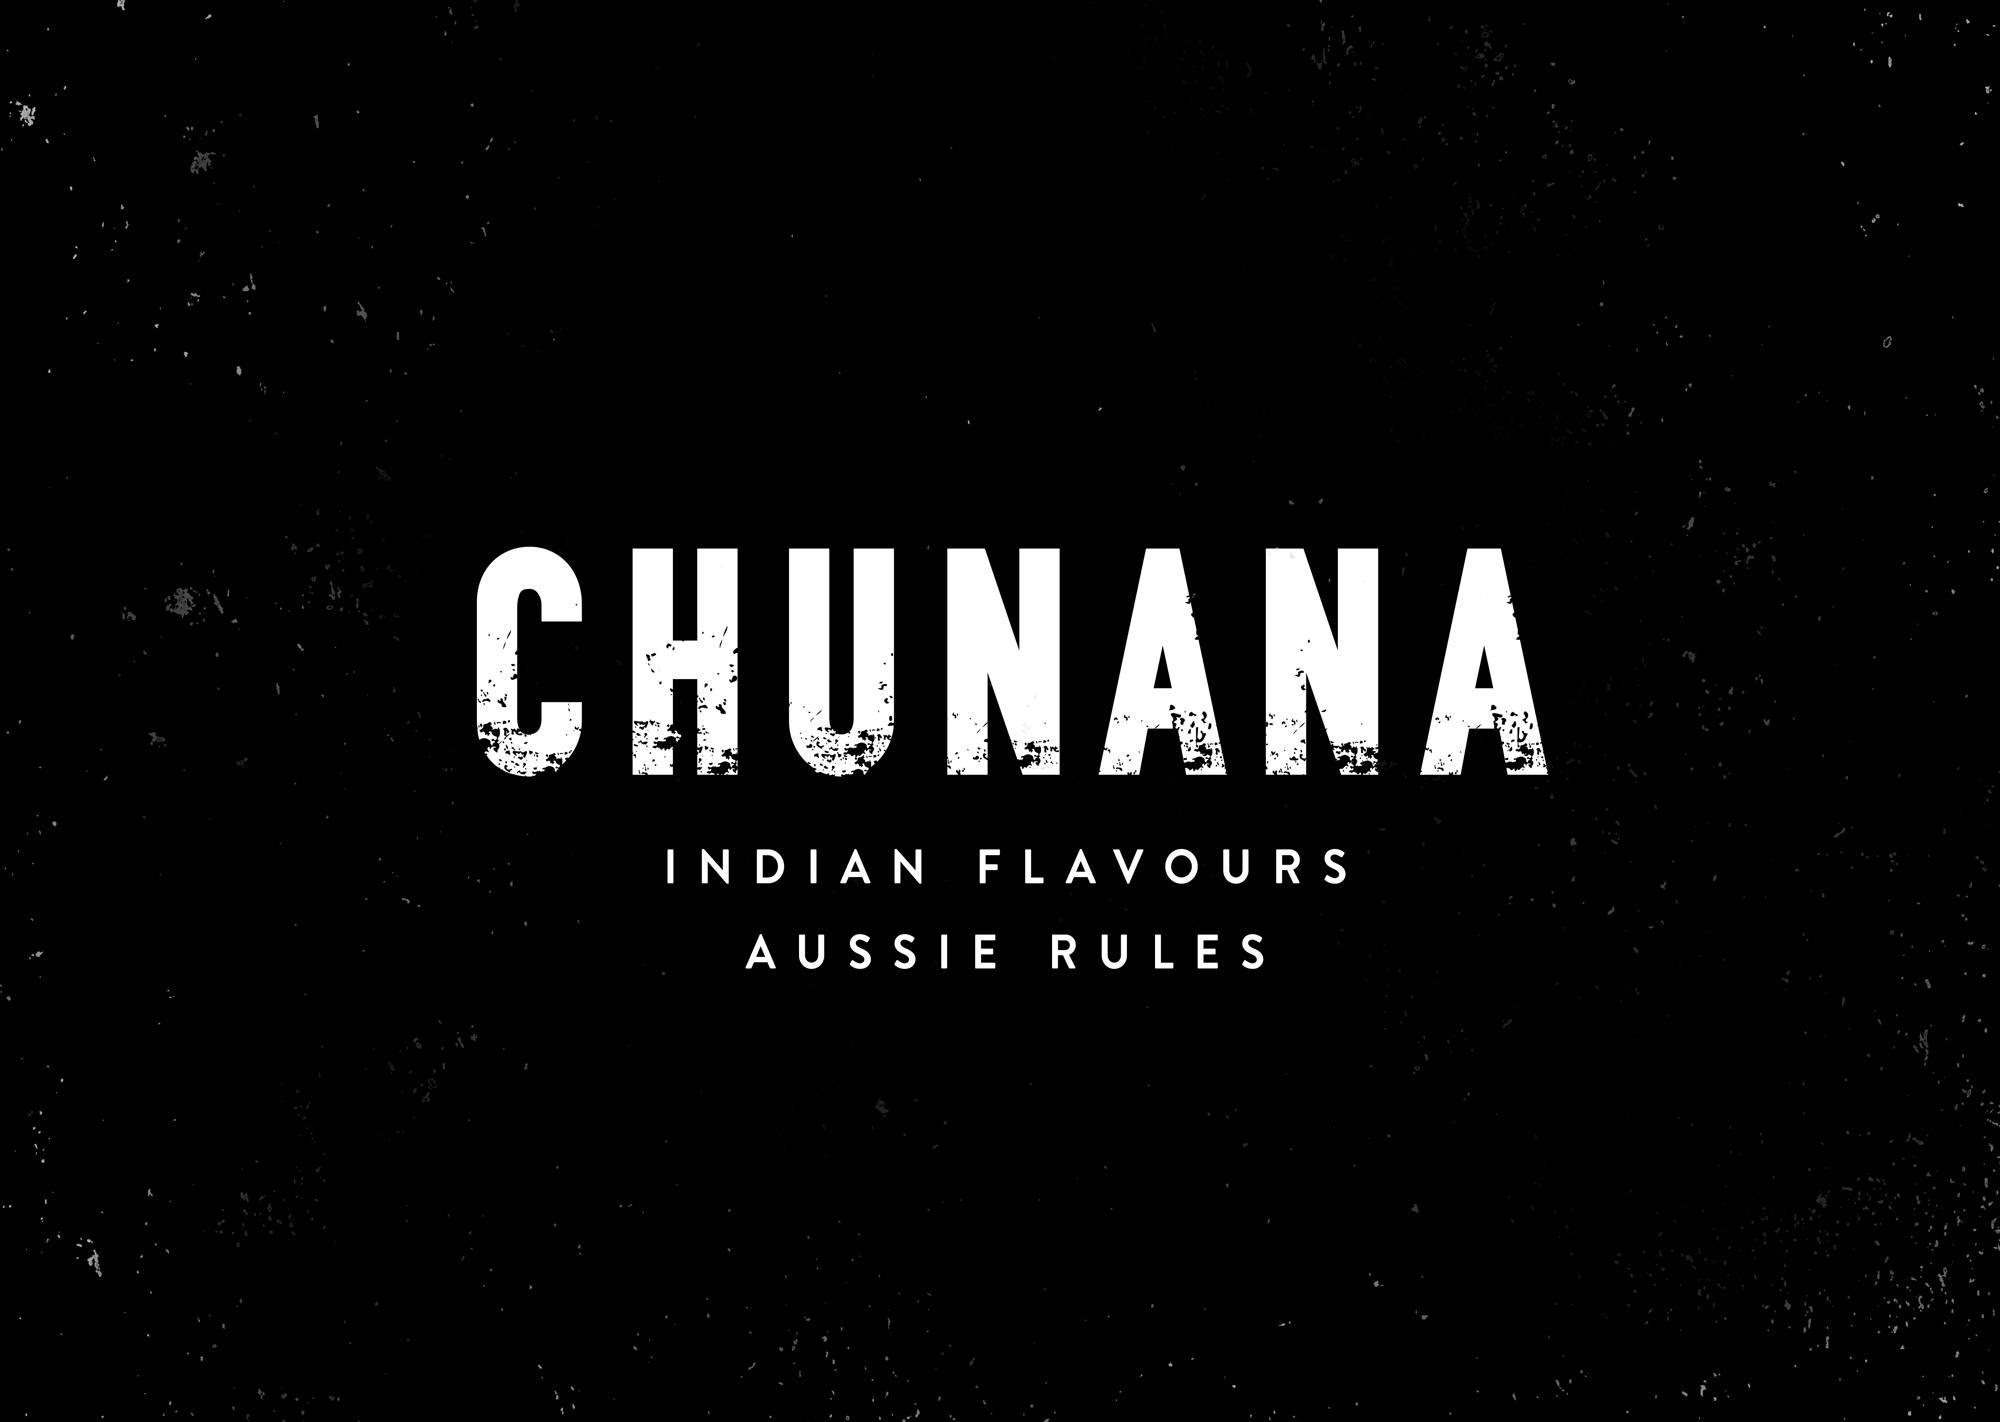 Chunana-black-grungeBG.png